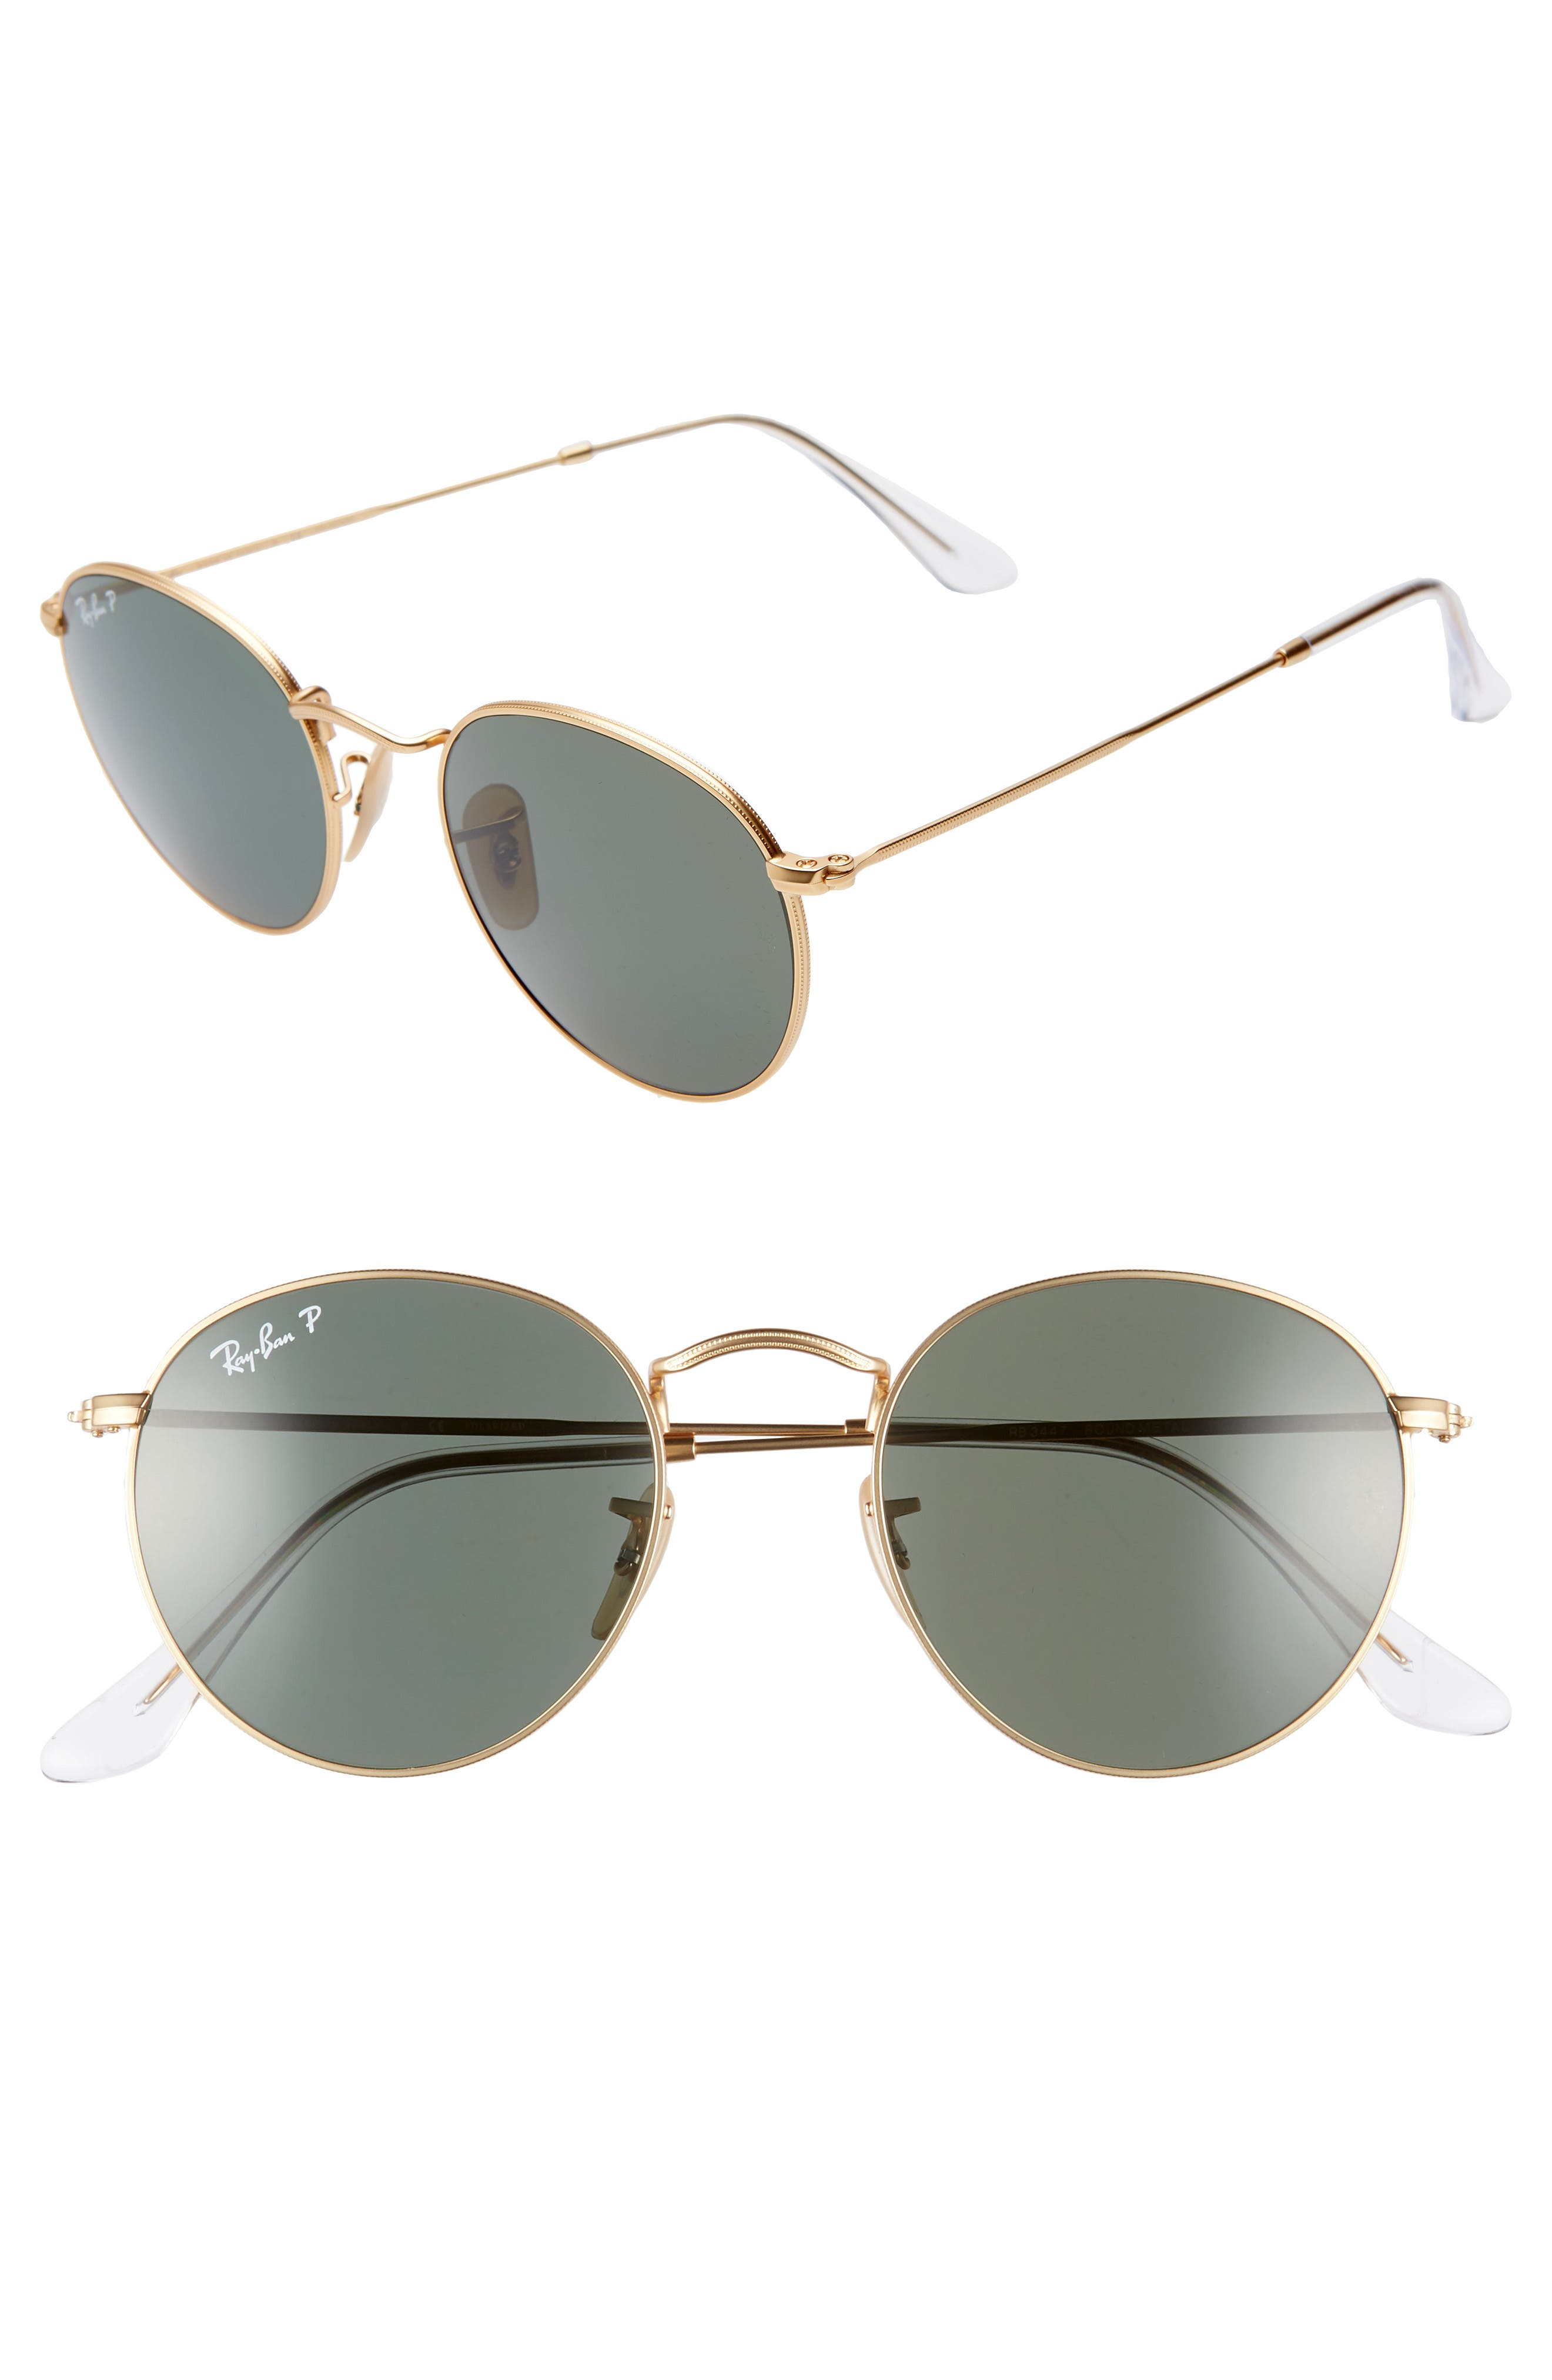 RAY-BAN, 50mm Polarized Round Sunglasses, Main thumbnail 1, color, 710